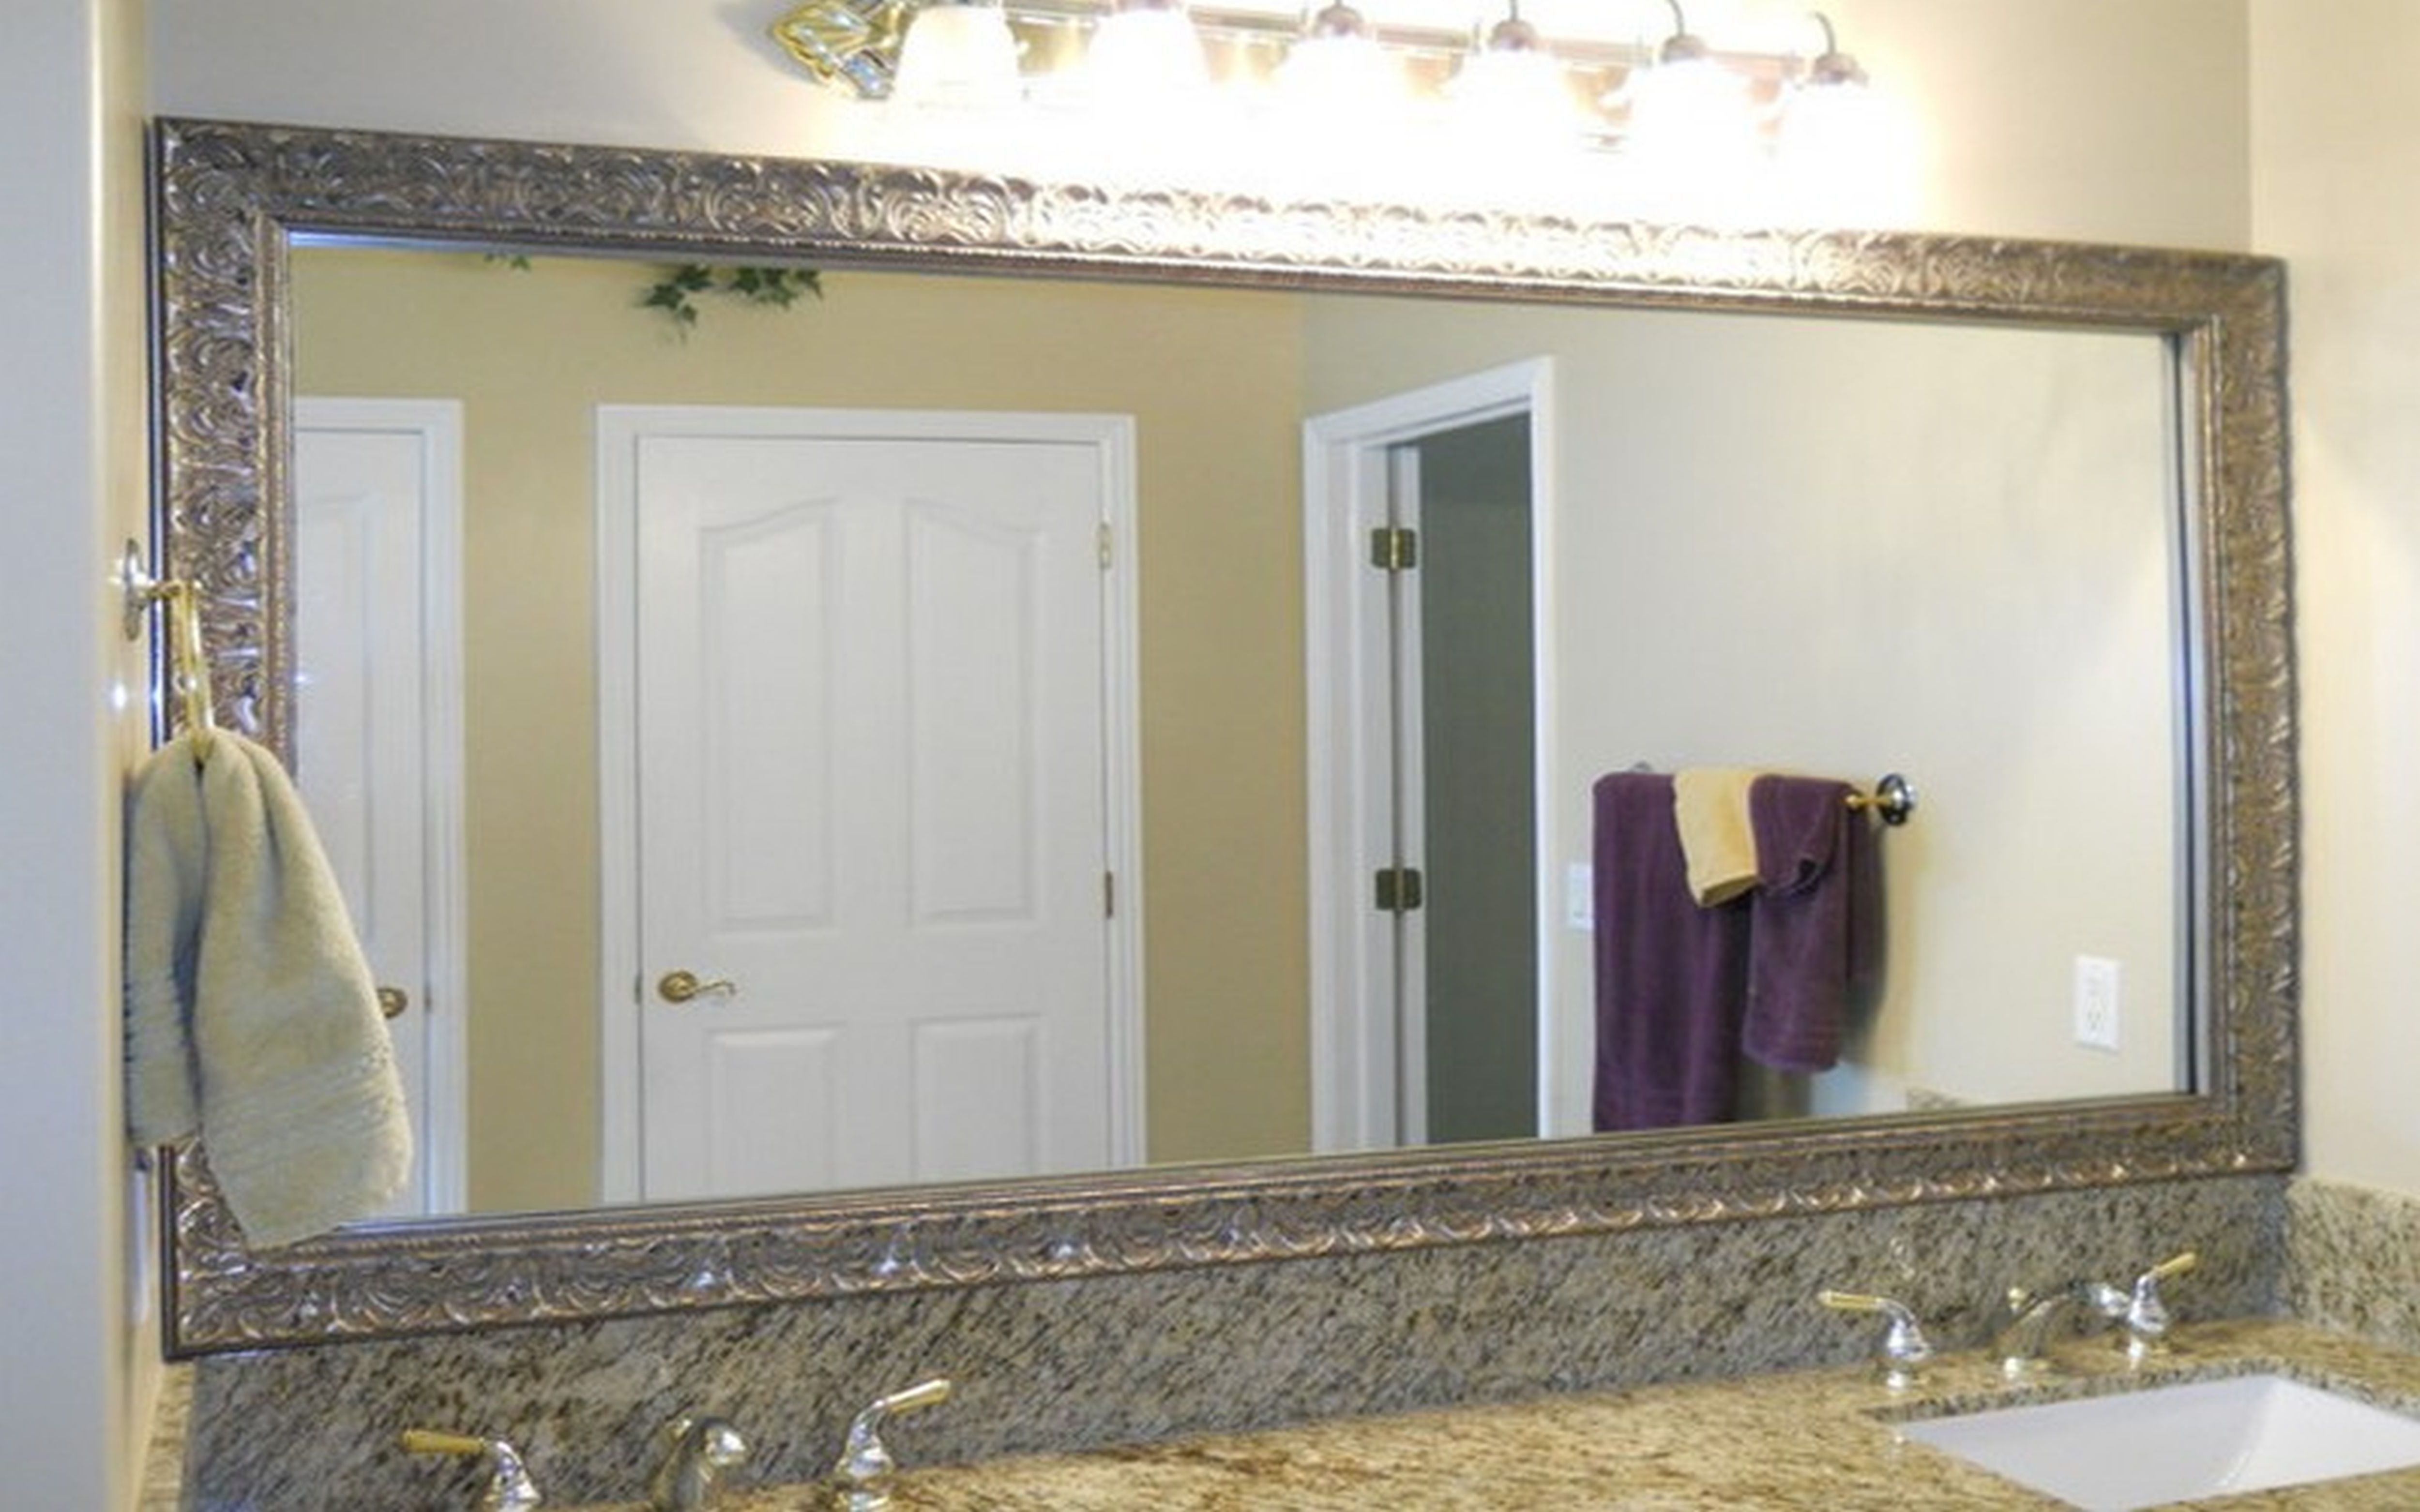 Large Landscape Bathroom Mirrors Home Regarding Large Landscape Mirror (Image 9 of 15)